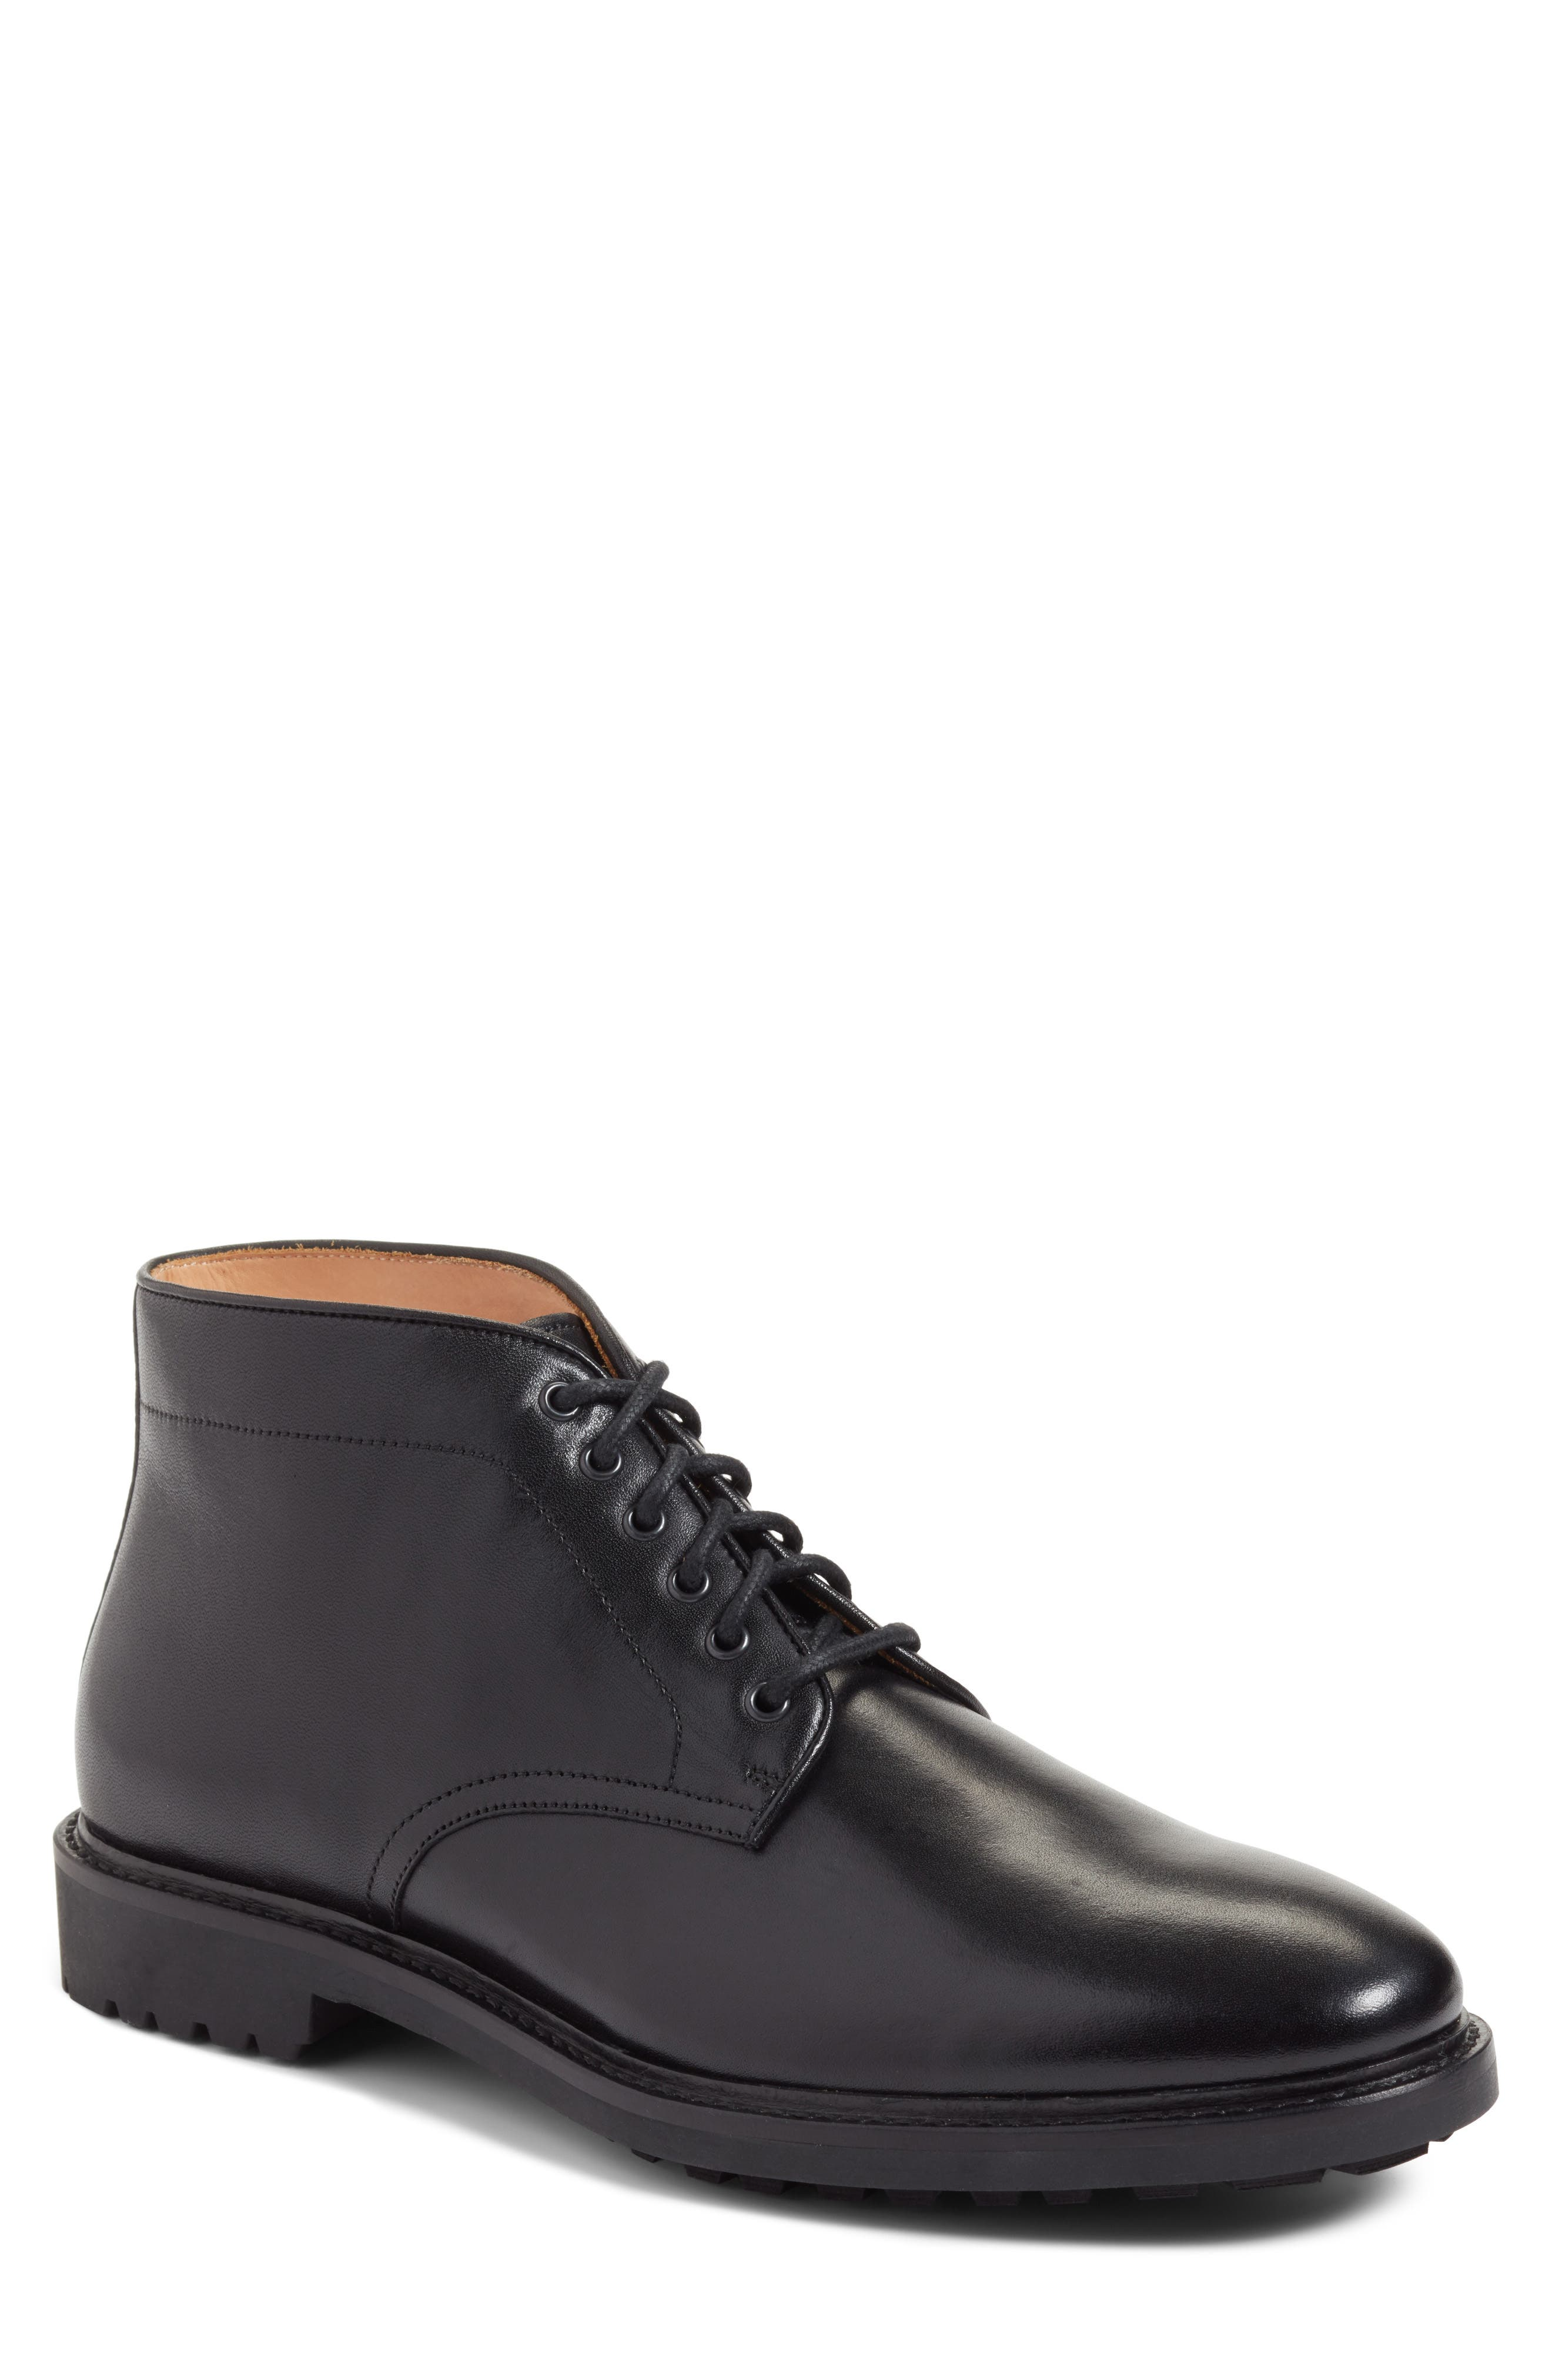 Main Image - John W. Nordstrom® Ramiro Plain Toe Boot (Men)